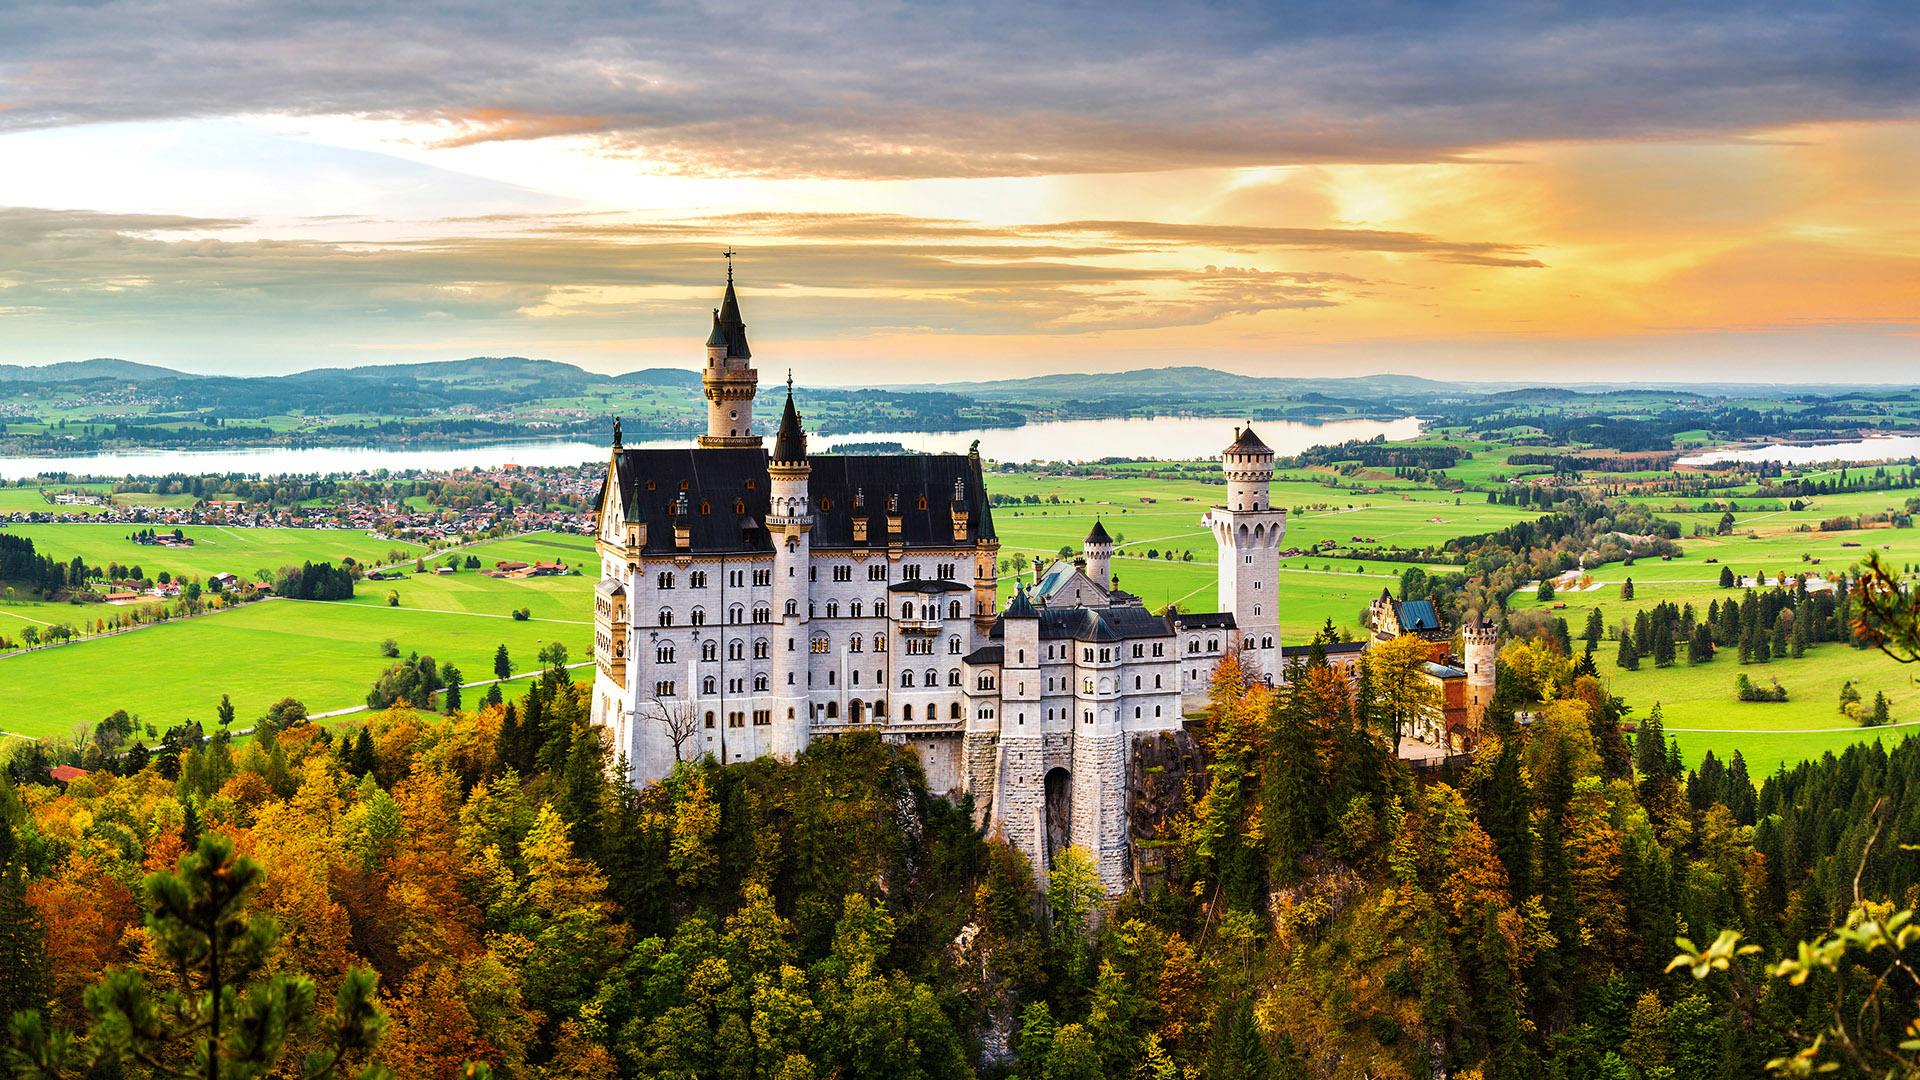 lâu đài Neuschwanstein Đức